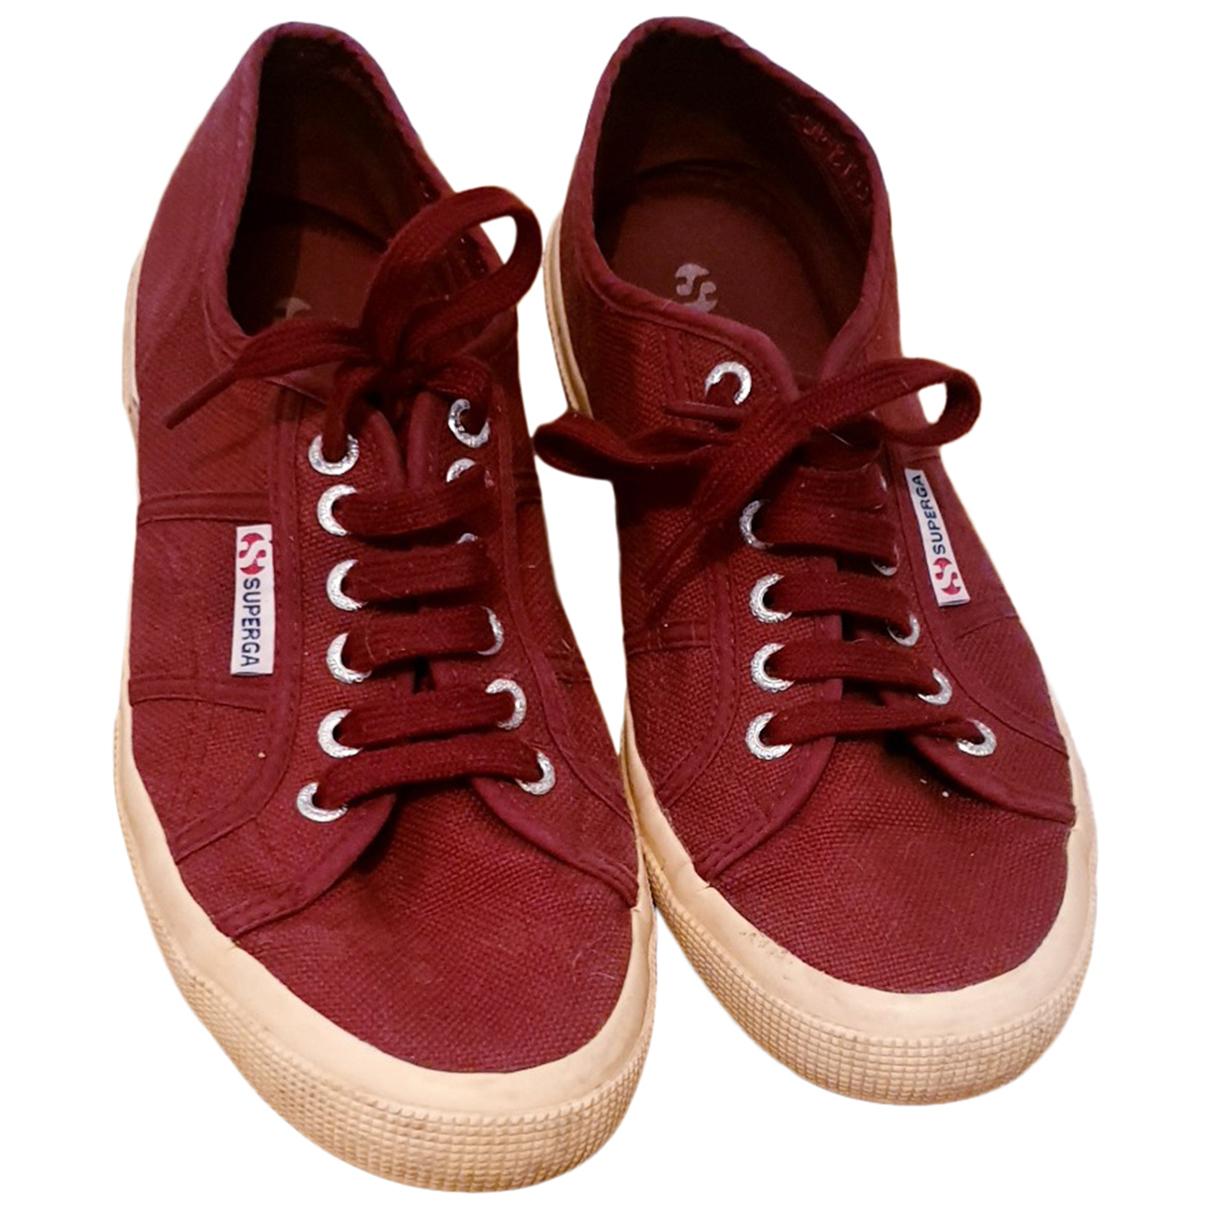 Superga \N Sneakers in  Bordeauxrot Leinen